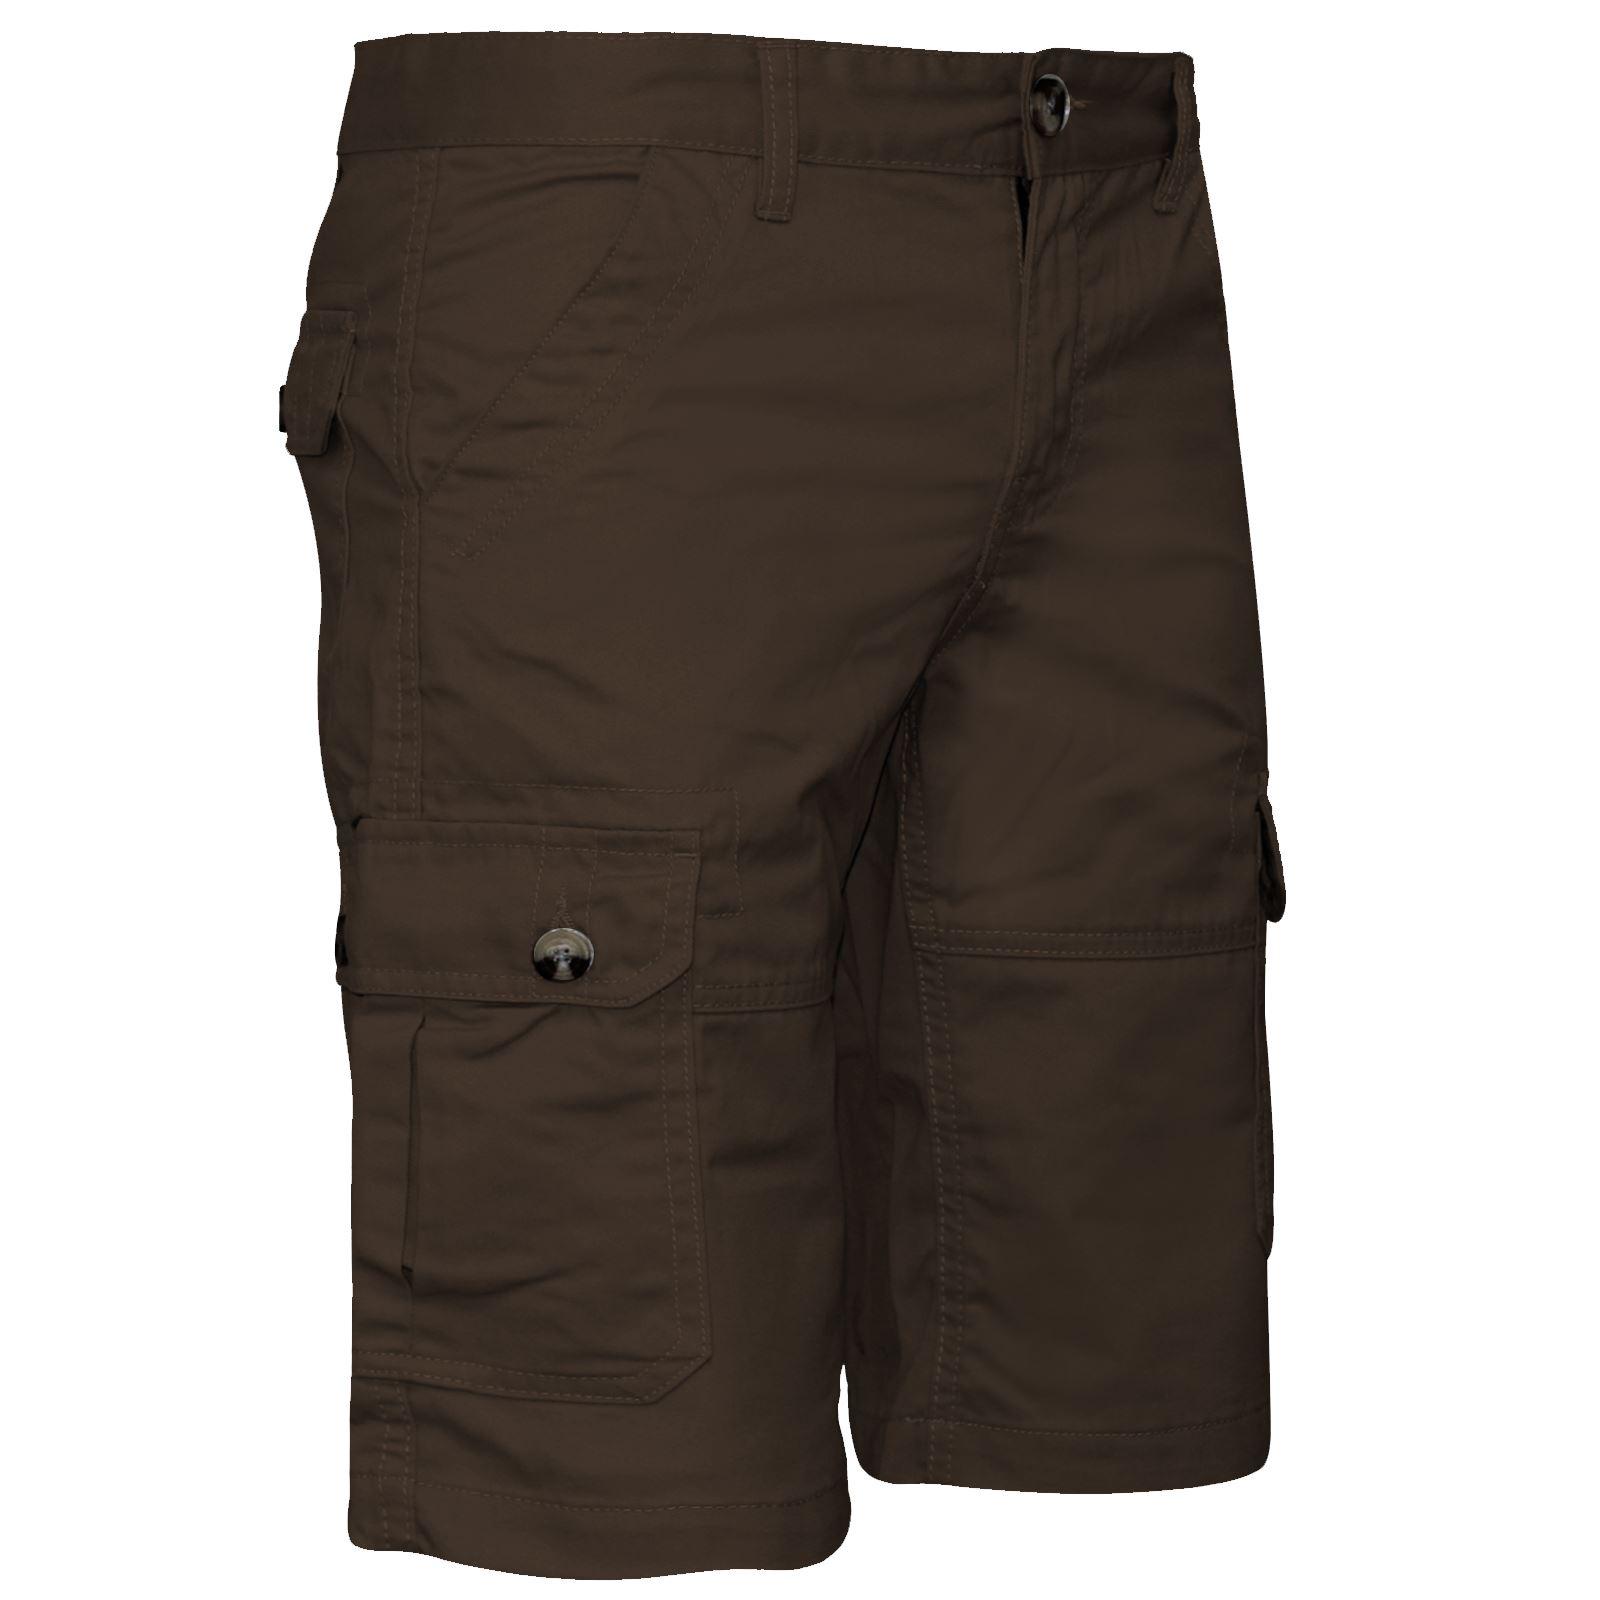 30-44 Men/'s new 100/% cotton cargo combat summer knee length half pant UK size